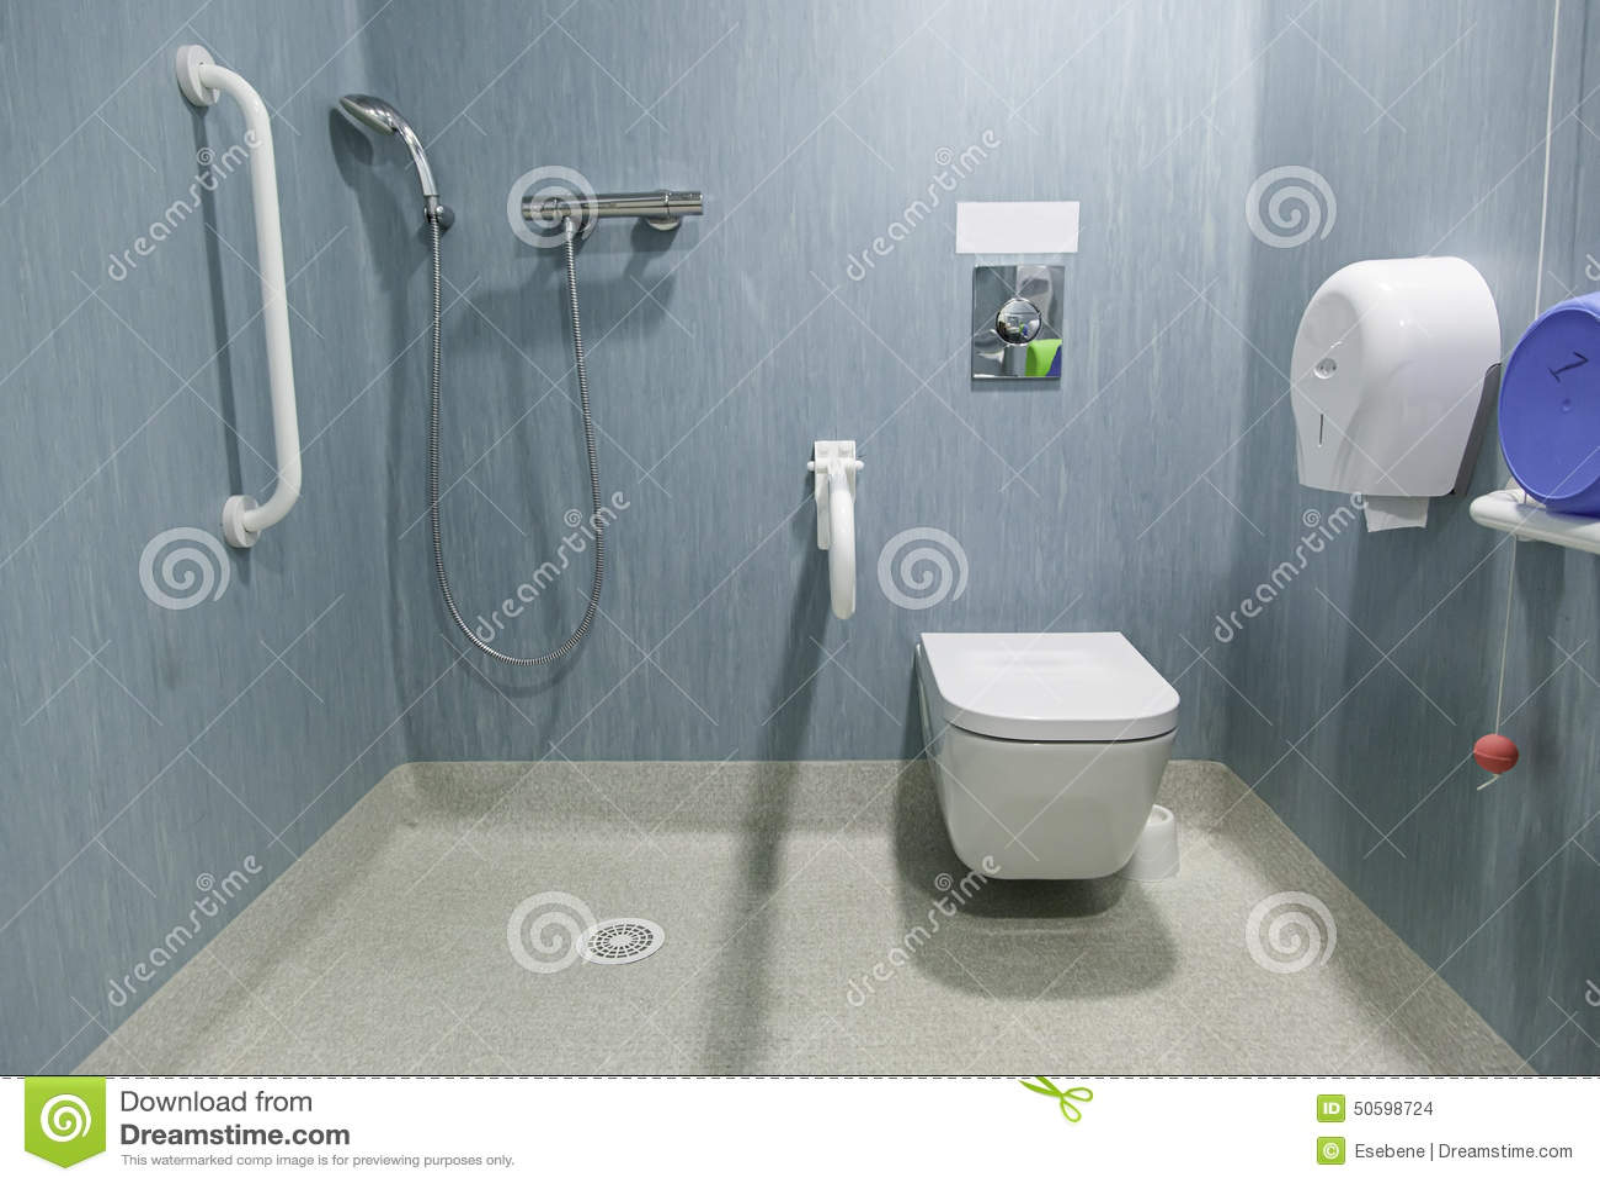 salle de bains handicap e photo stock image 50598724. Black Bedroom Furniture Sets. Home Design Ideas